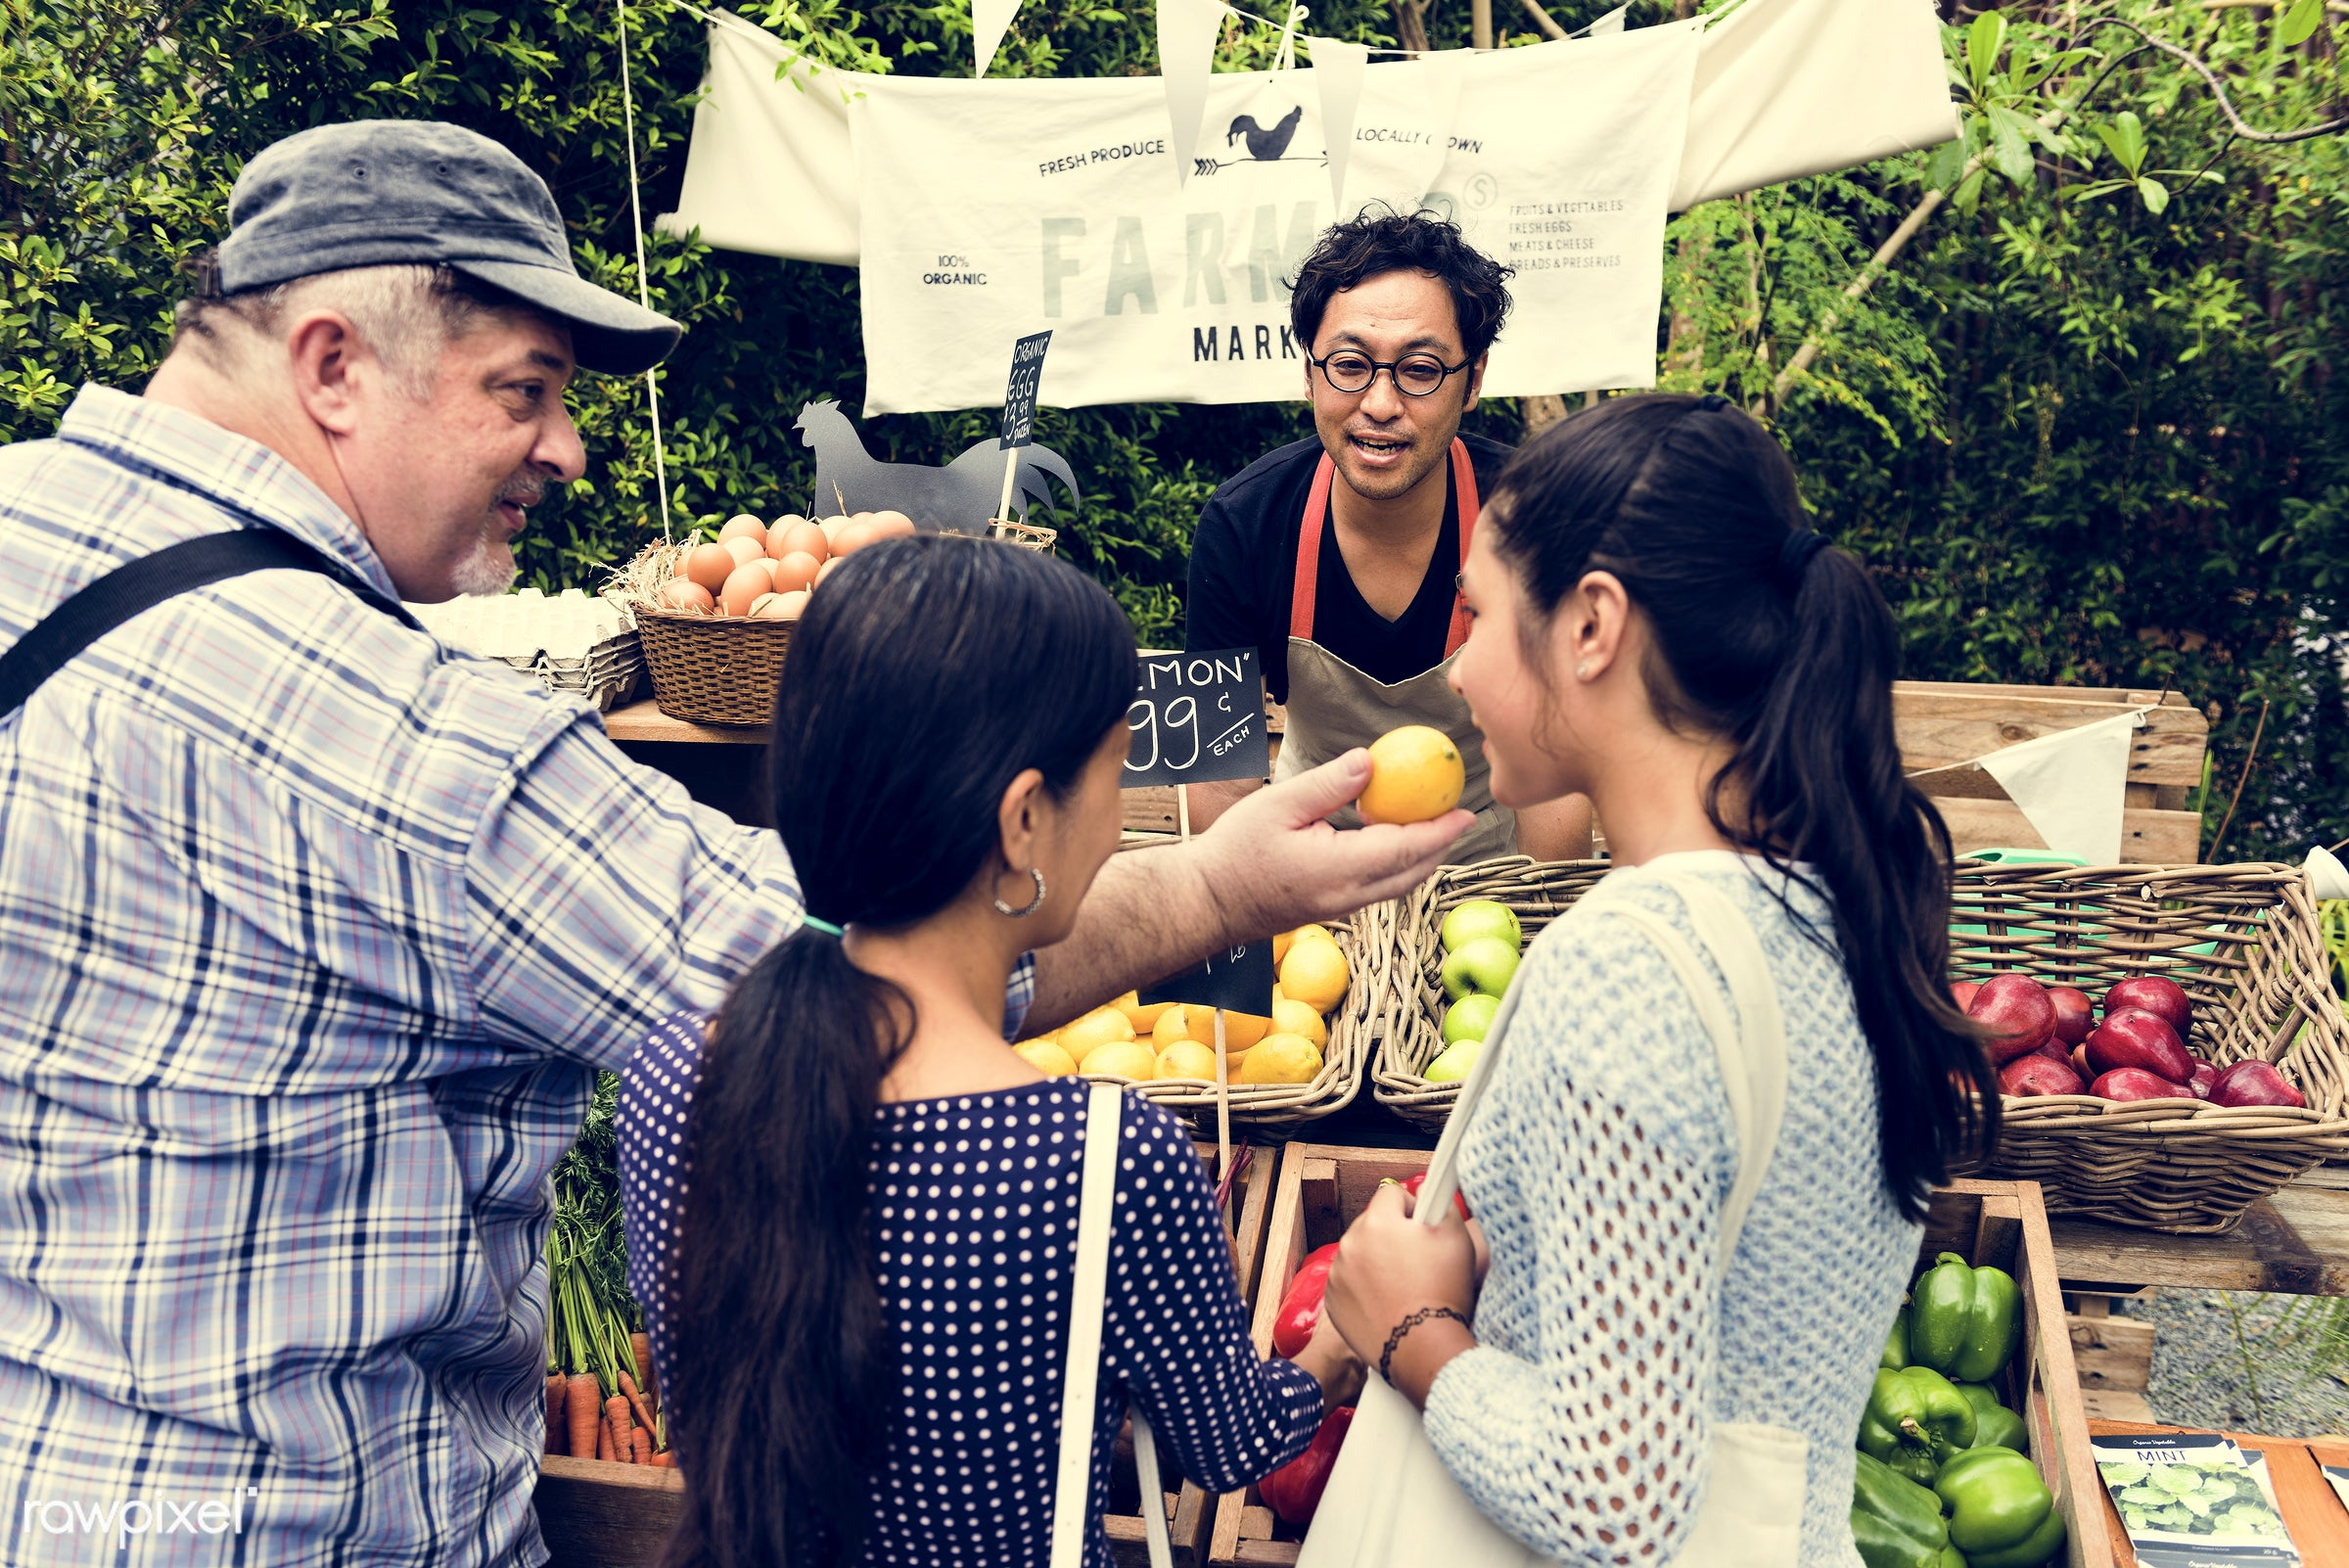 grocery, shop, carrot, nutritious, store, bell pepper, egg, asian ethnicity, farmer, fresh, healthy eating, men, marketplace...